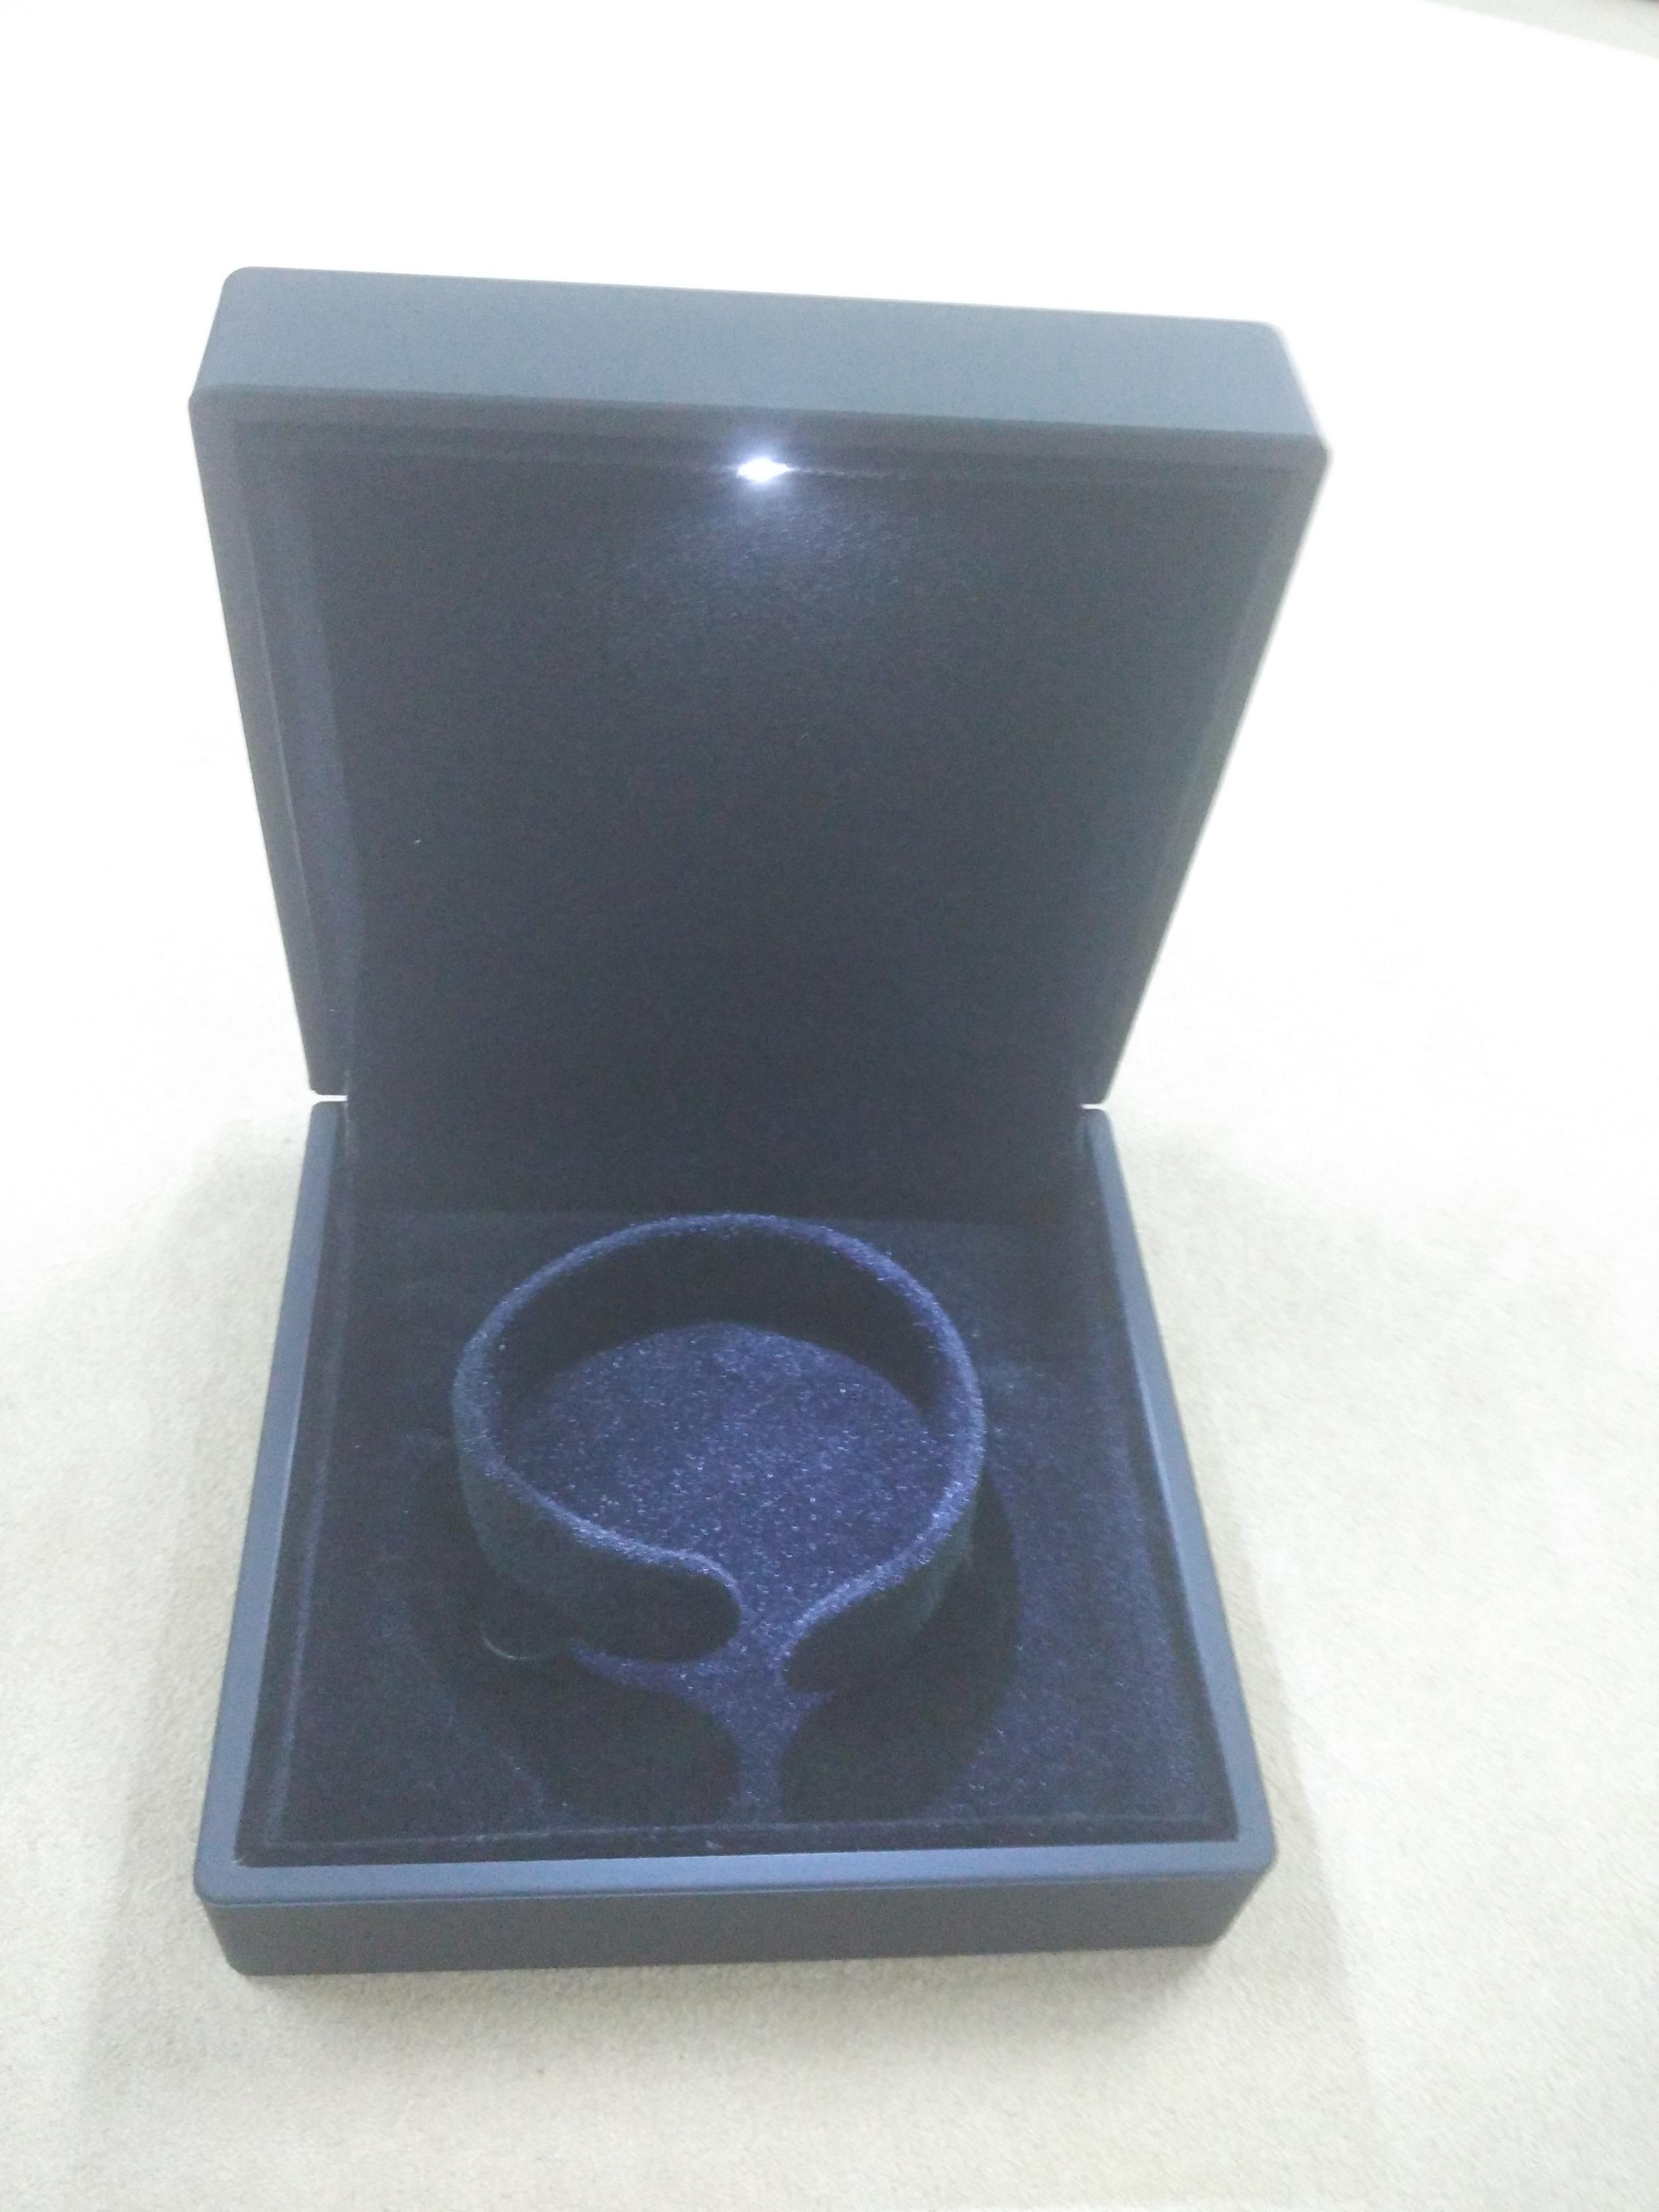 Black Rubber Paint Jewelry Plastic Box